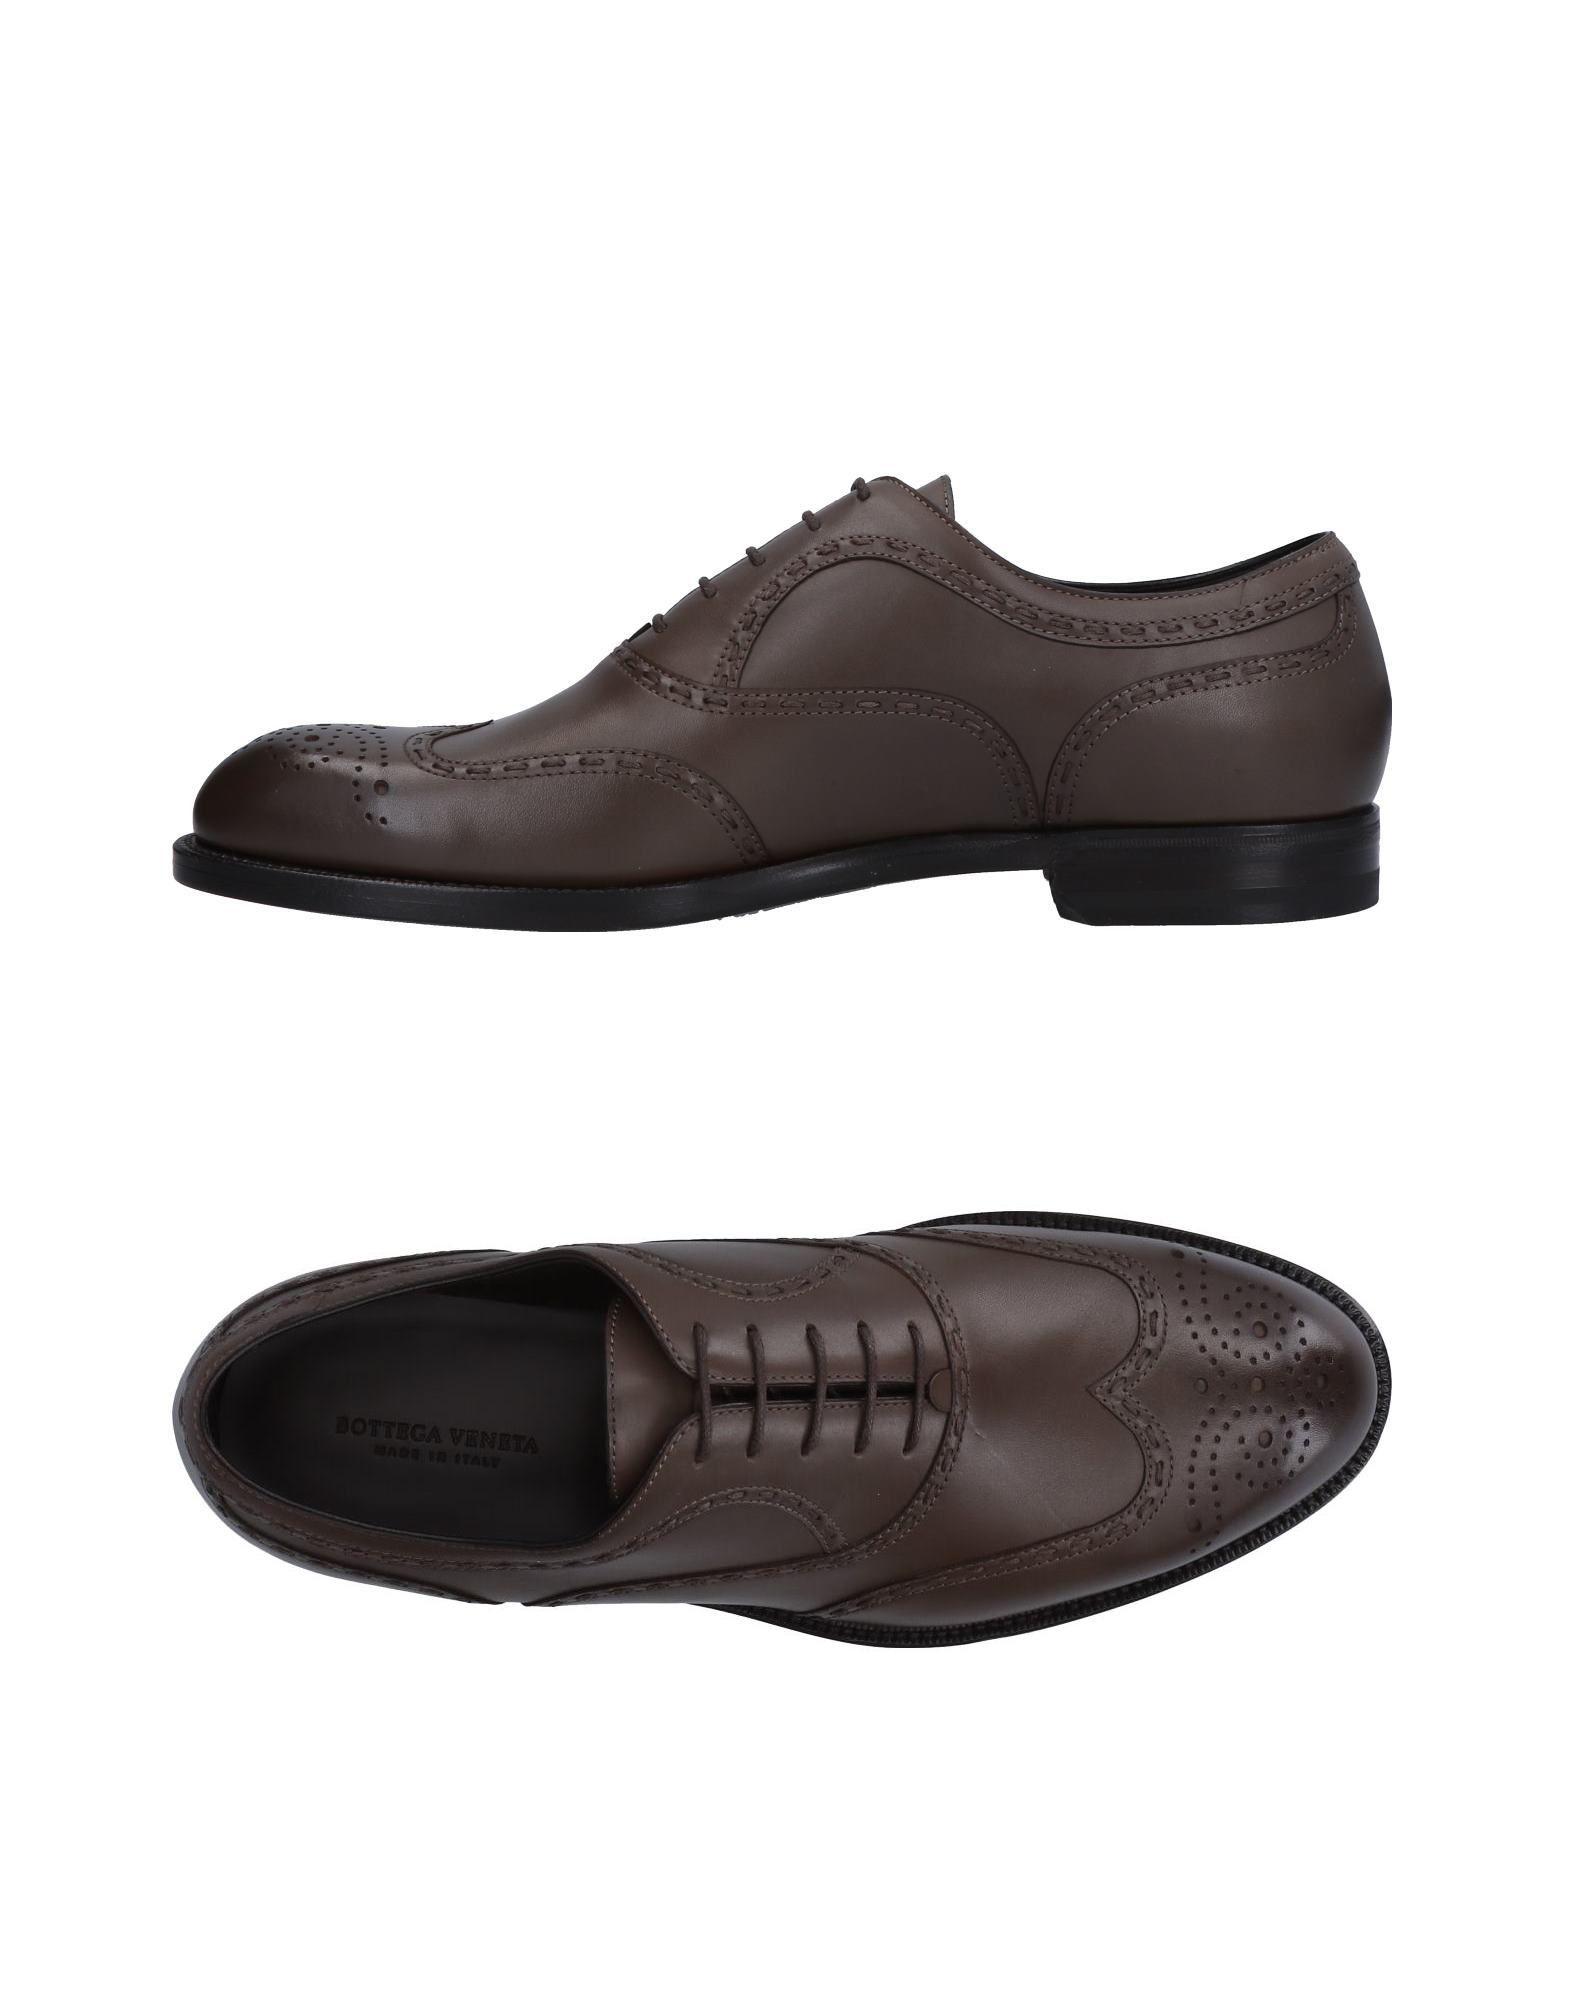 Bottega Veneta Schnürschuhe Herren  11106285OD Gute Qualität beliebte Schuhe